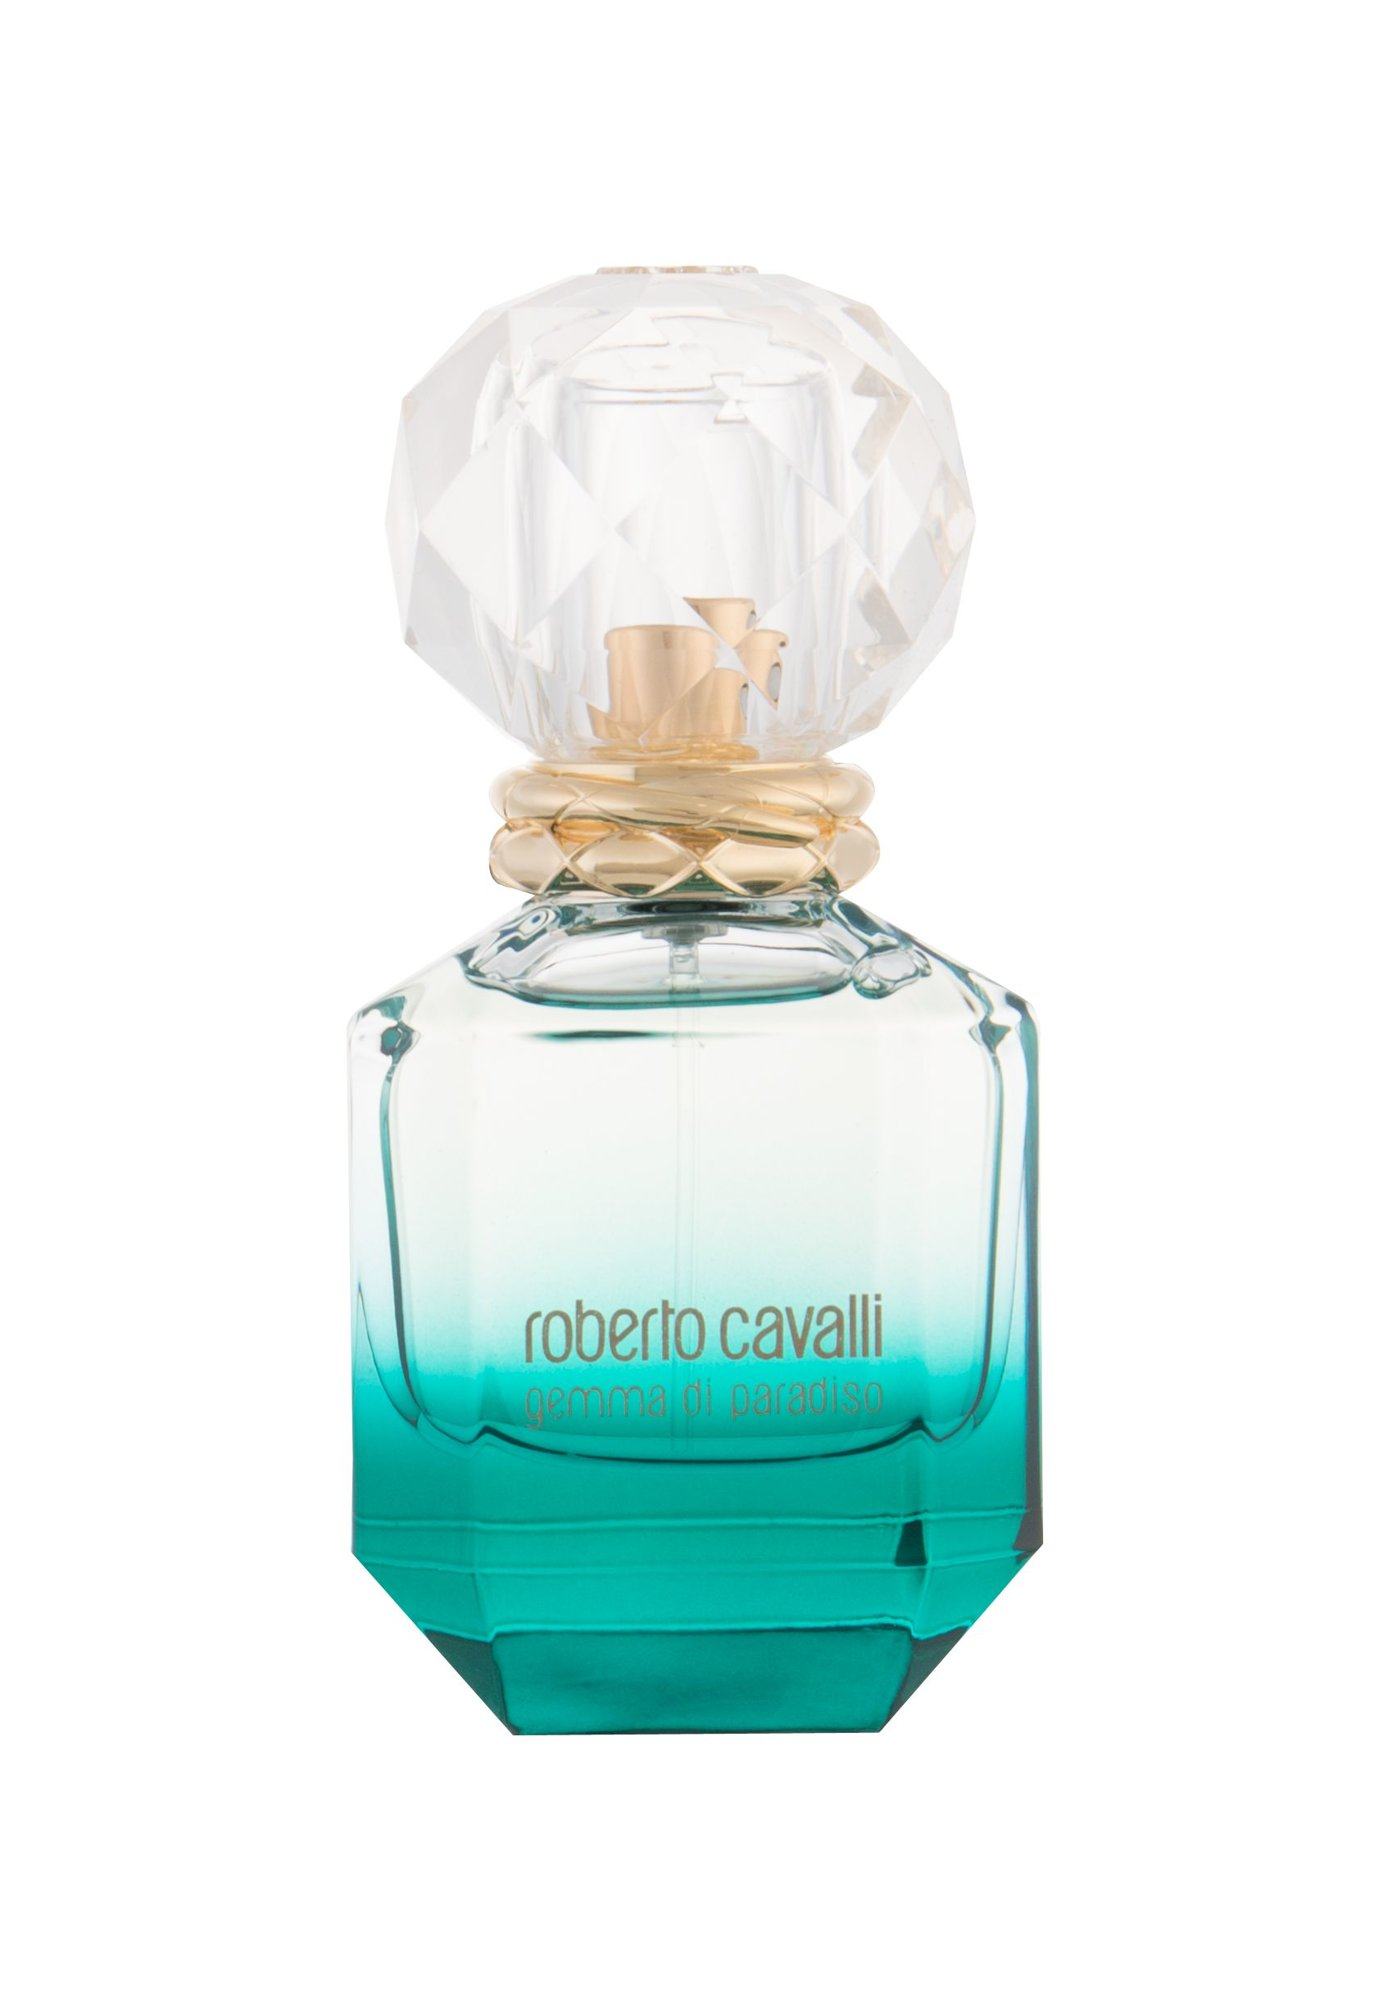 Roberto Cavalli Gemma di Paradiso Eau de Parfum 30ml